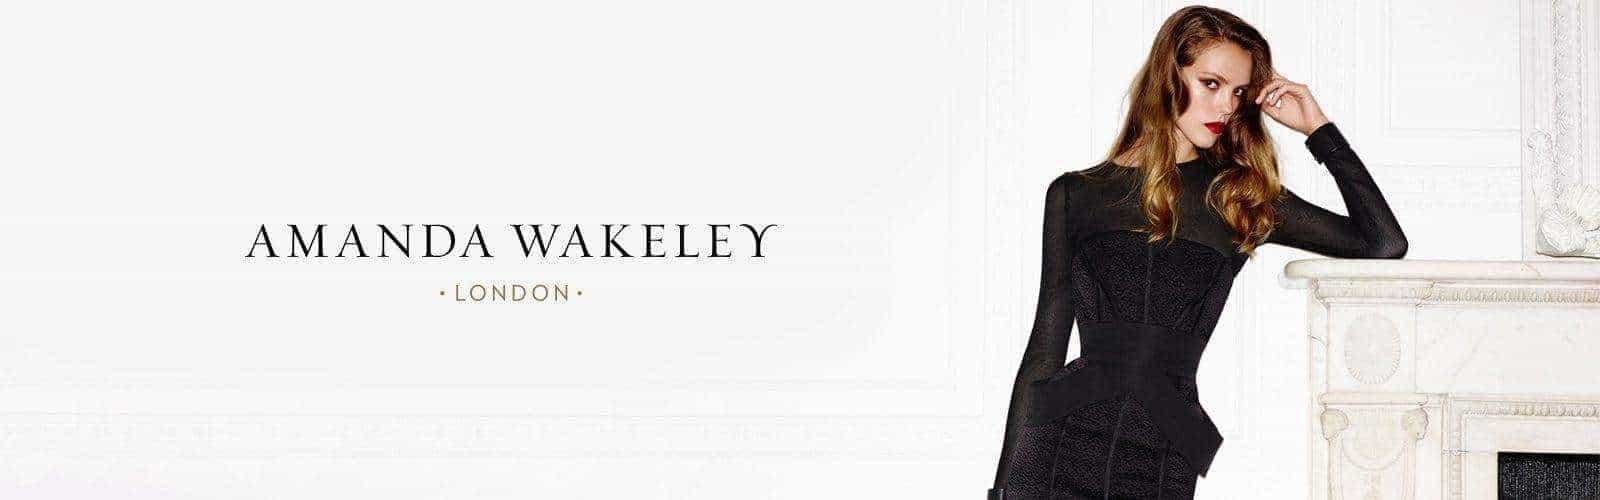 amanda-wakeley-header-2